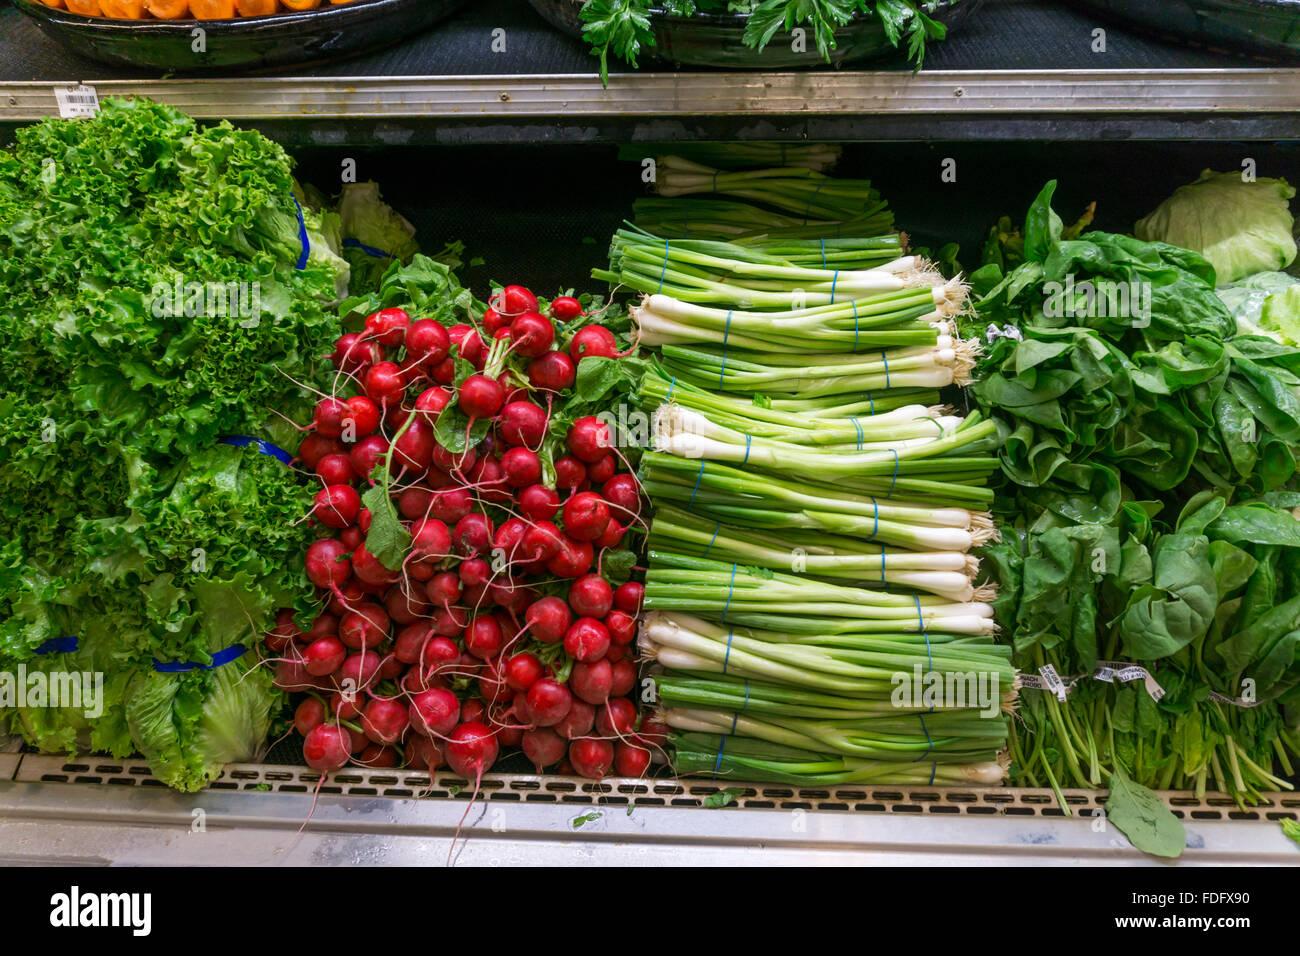 Fresh salad vegetables for sale in a supermarket - Stock Image